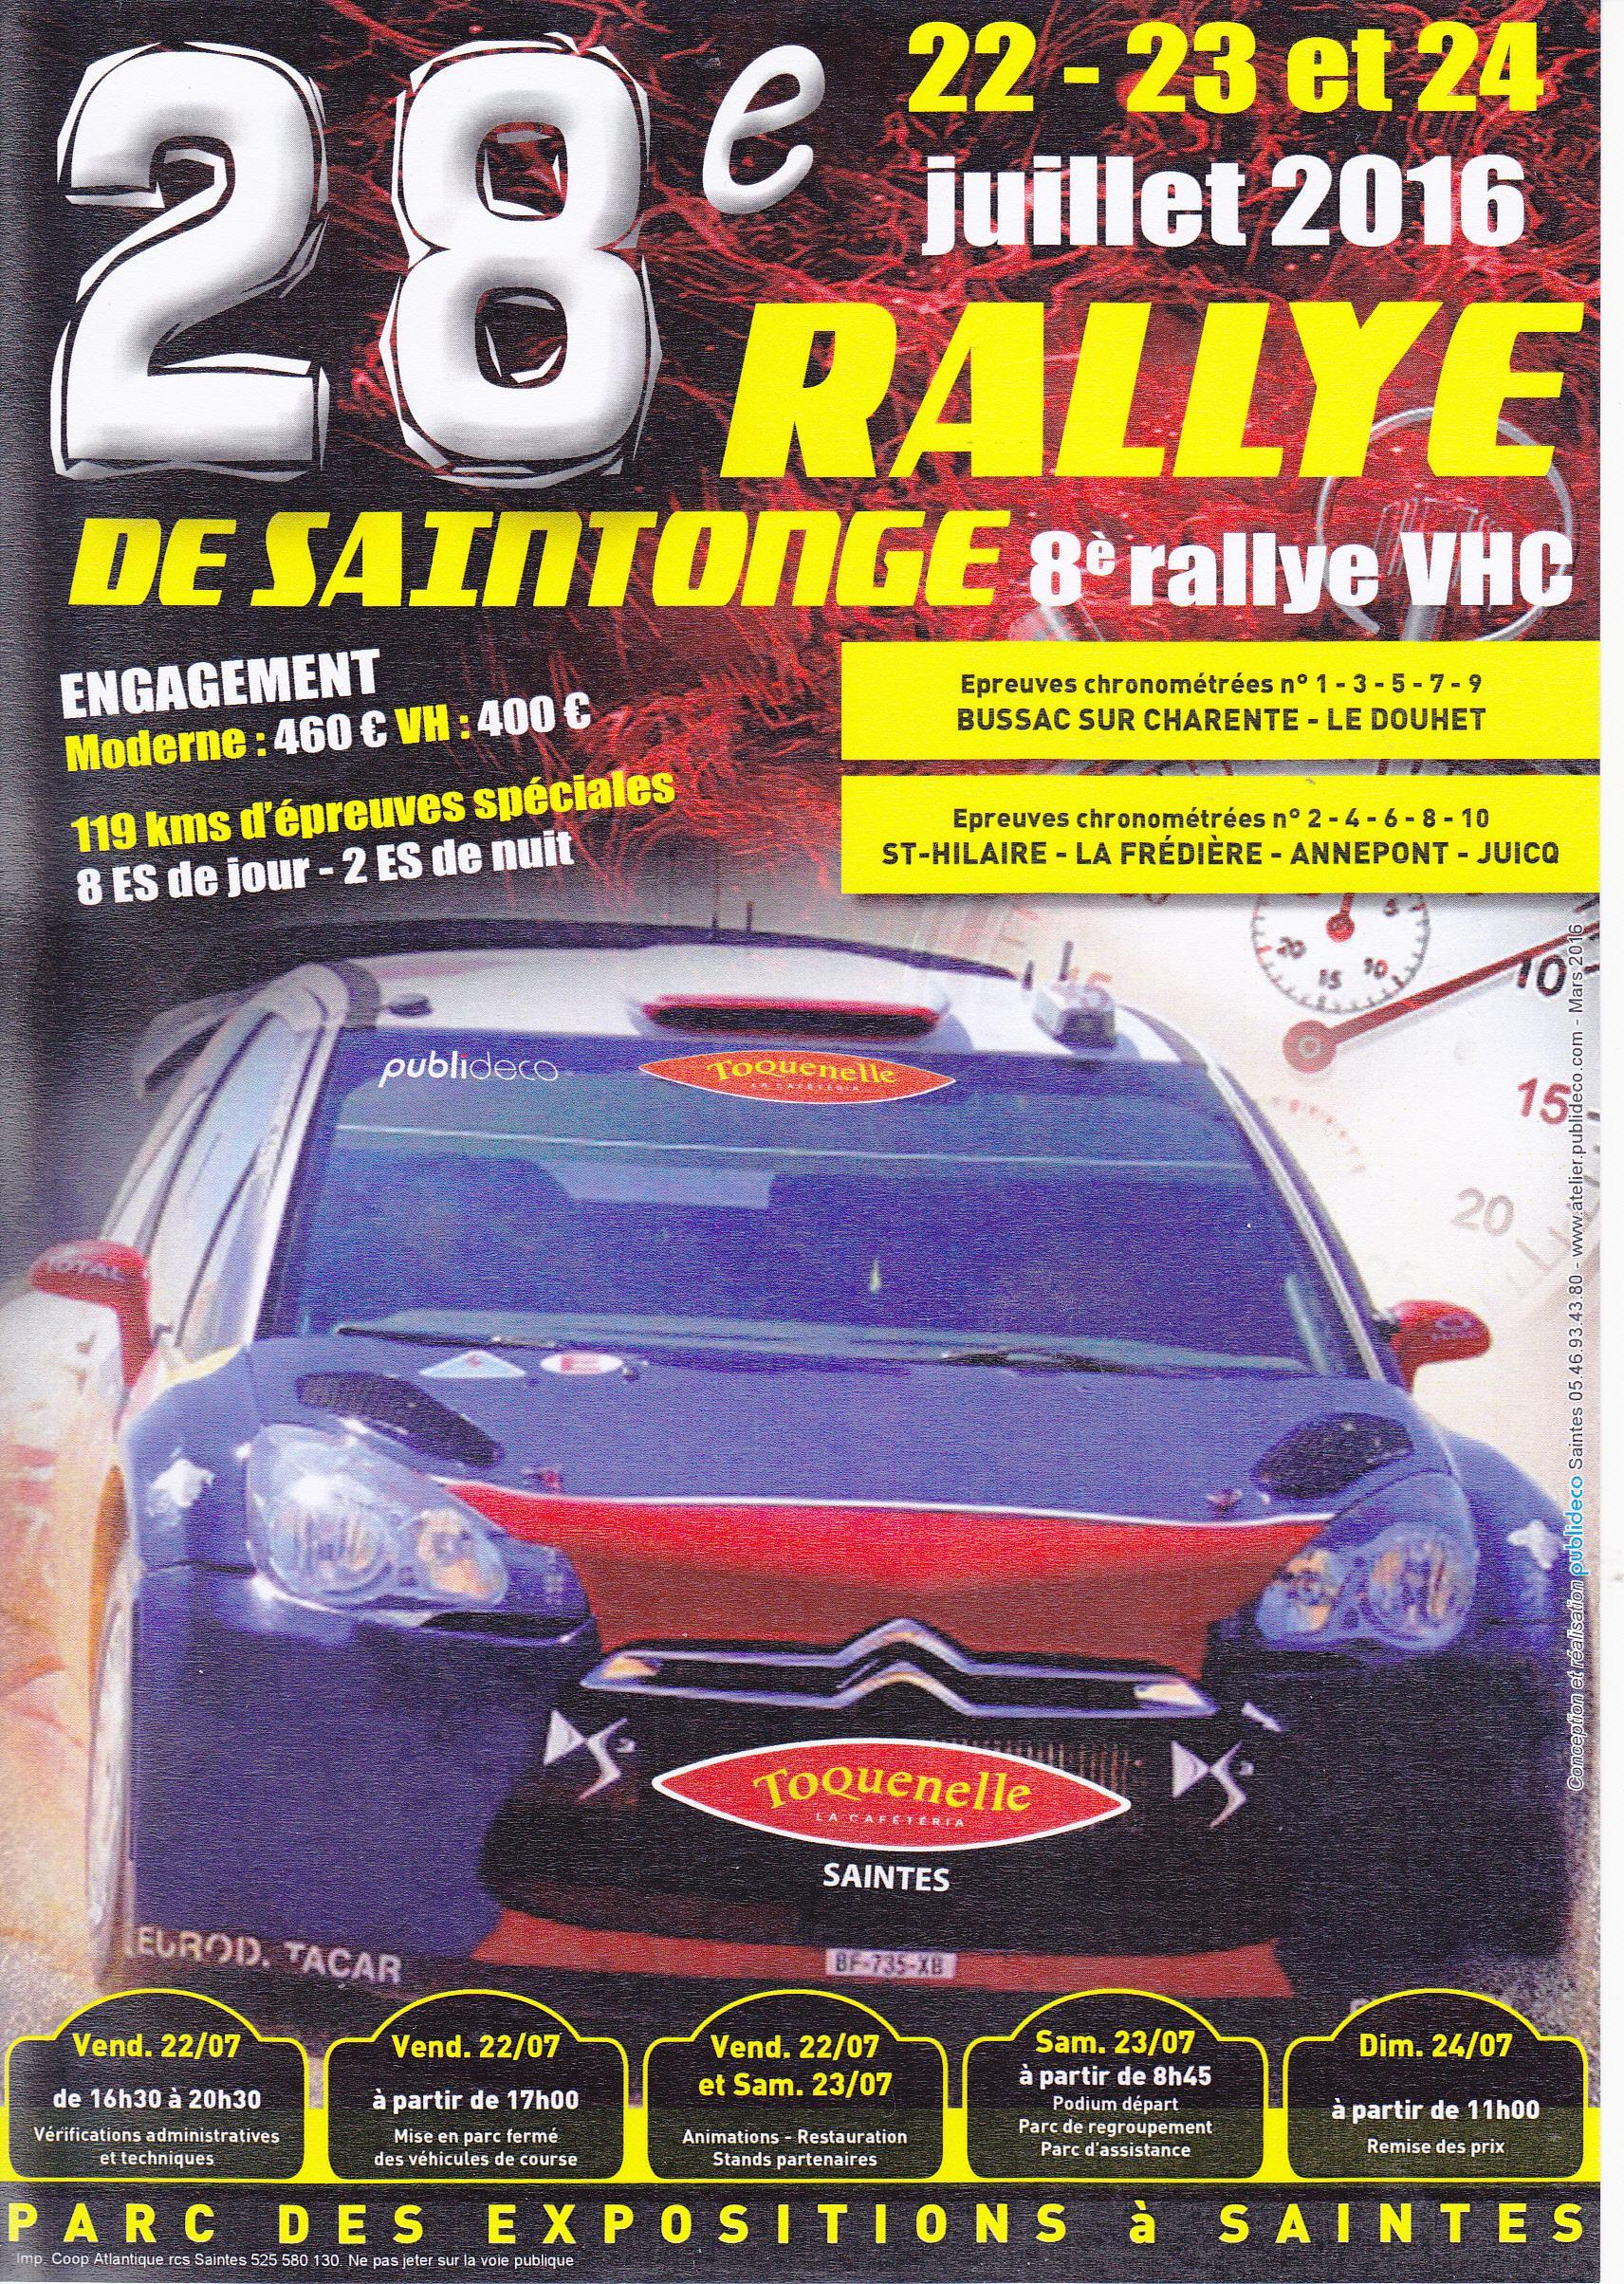 Rallye-de-Saintonge-2016